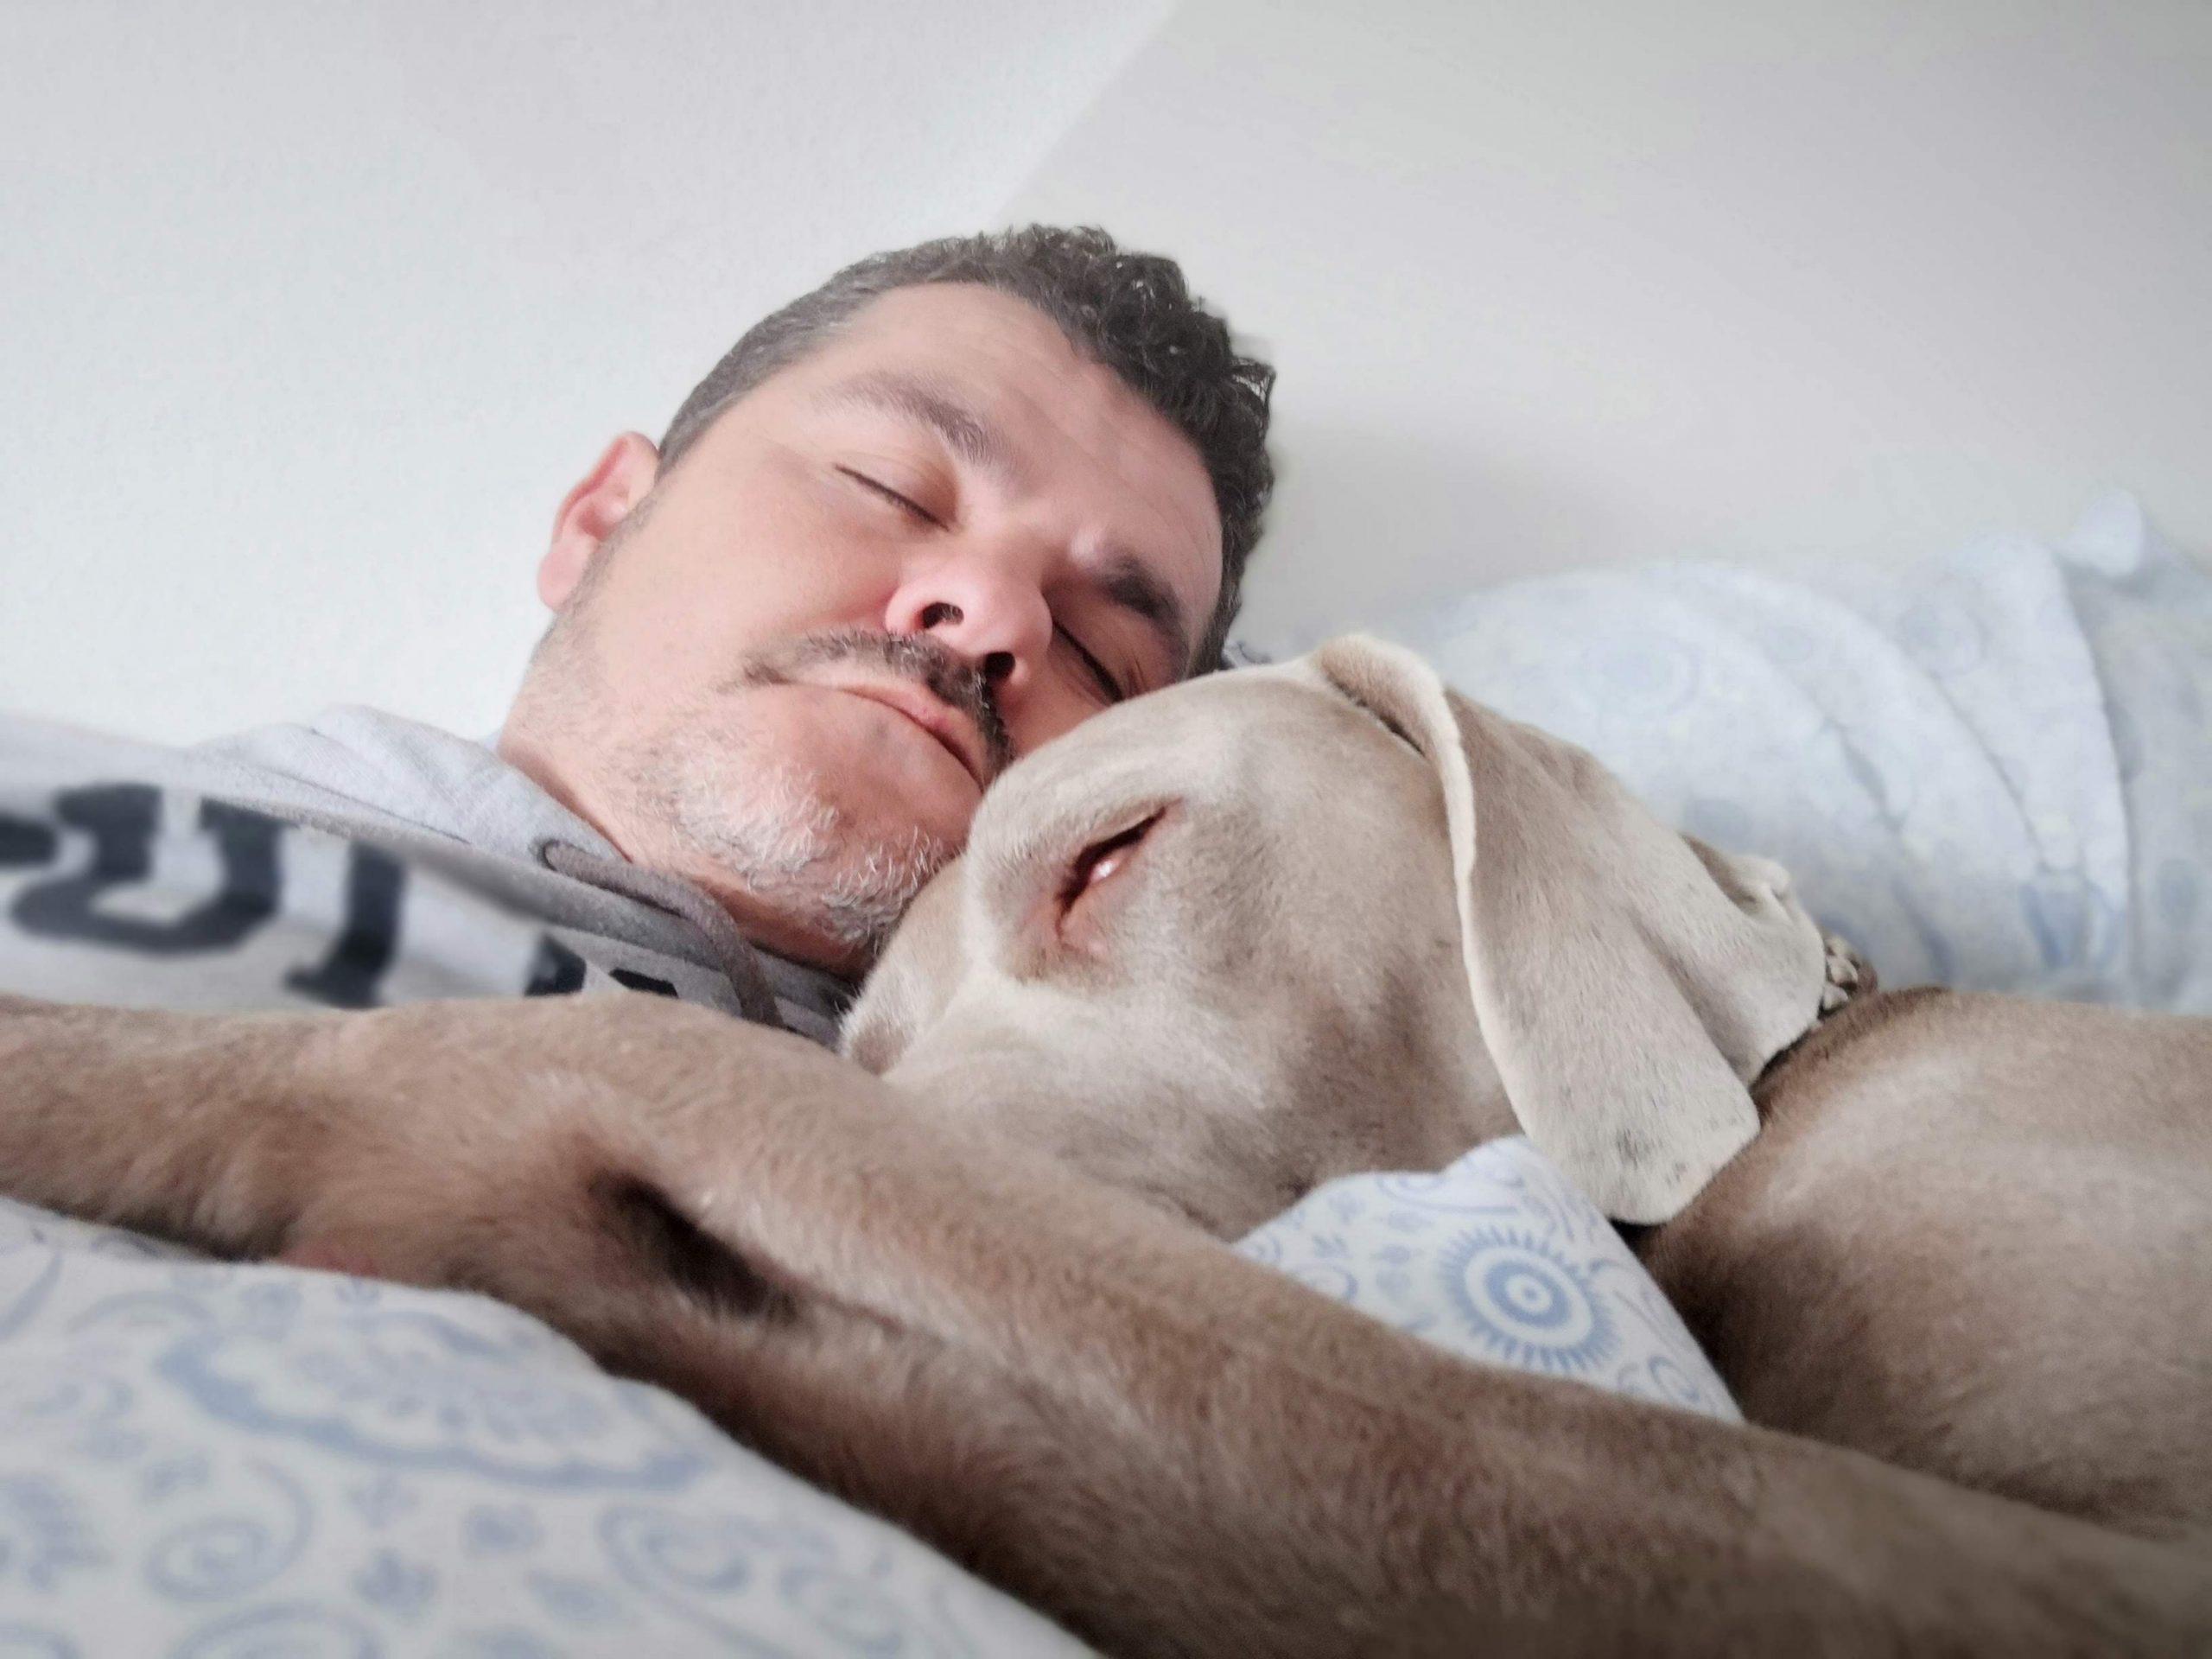 man asleep on bed with dog.